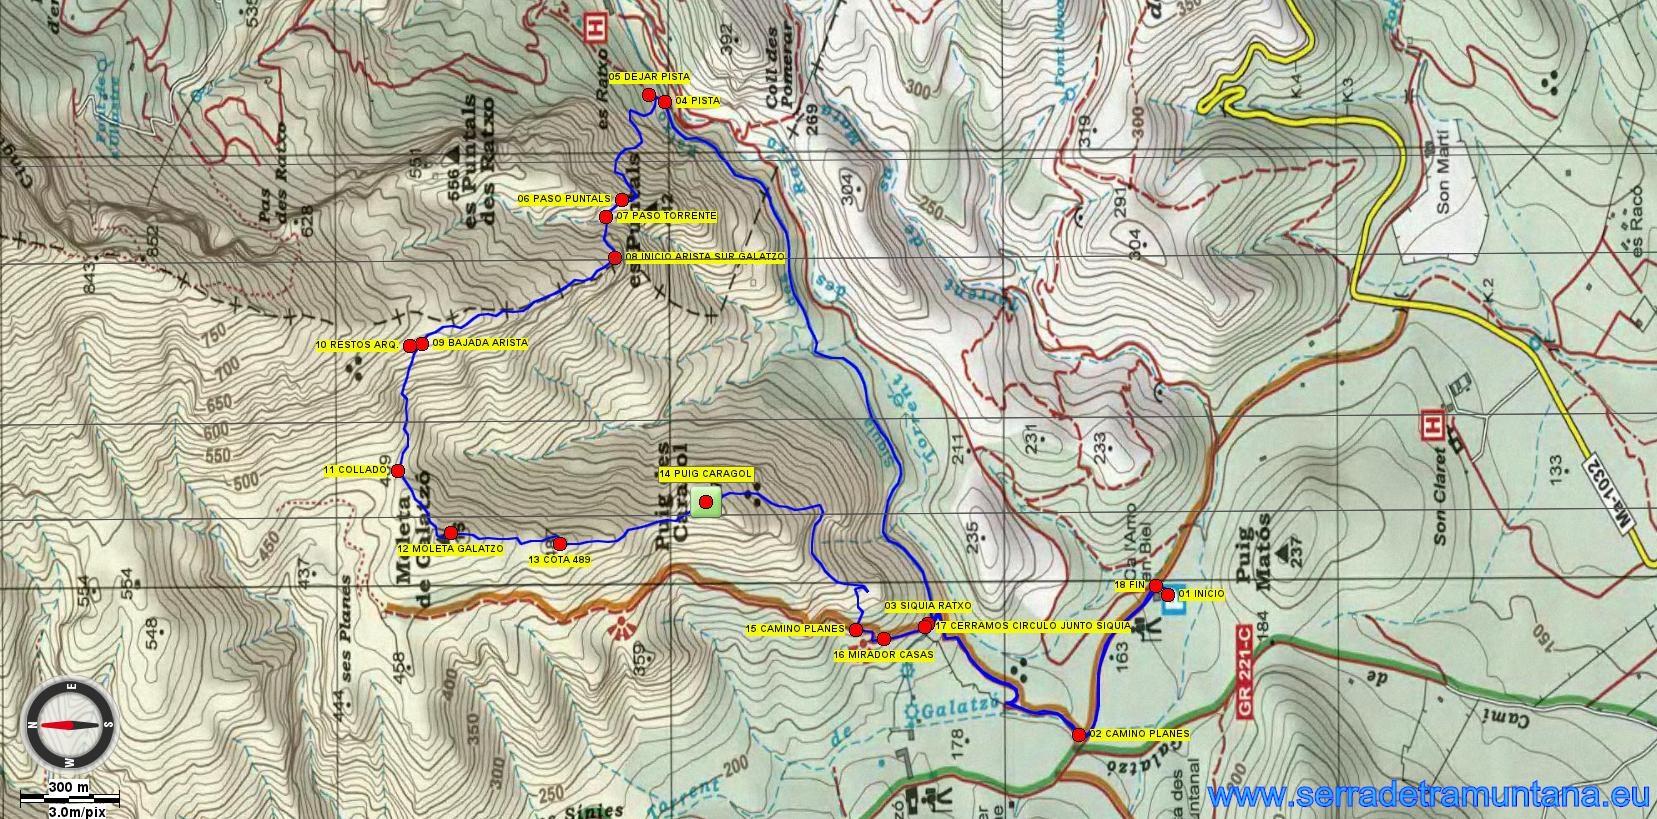 Recorte del mapa de Alpina de la zona, con la ruta realizada